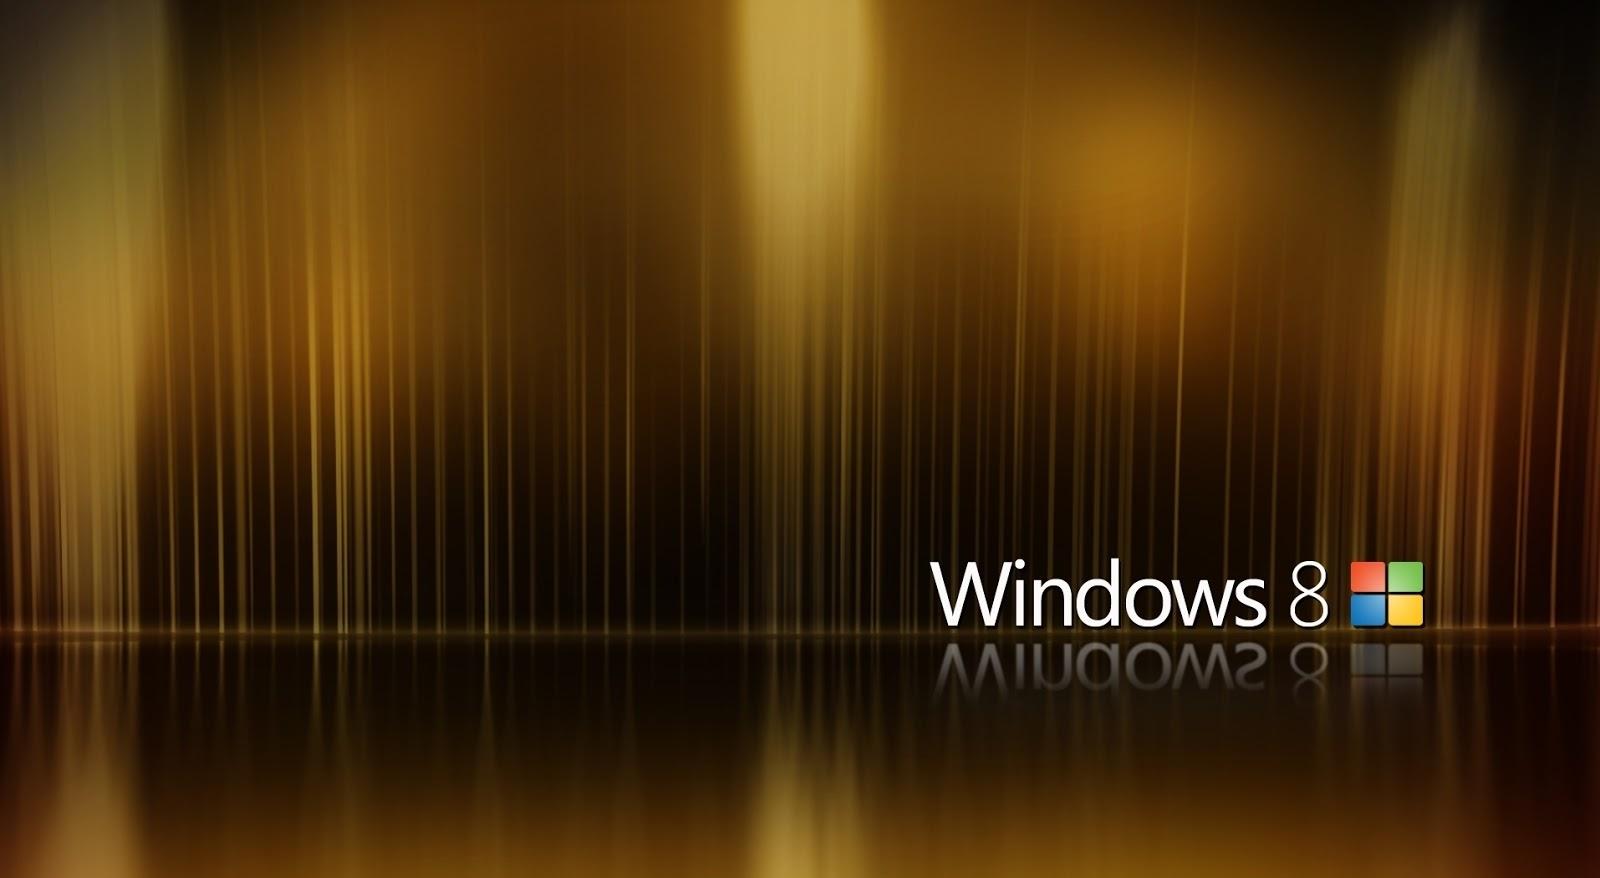 Fondos de pantalla de windows 8 colorear a heidi - Windows 8 1 wallpaper hd nature ...